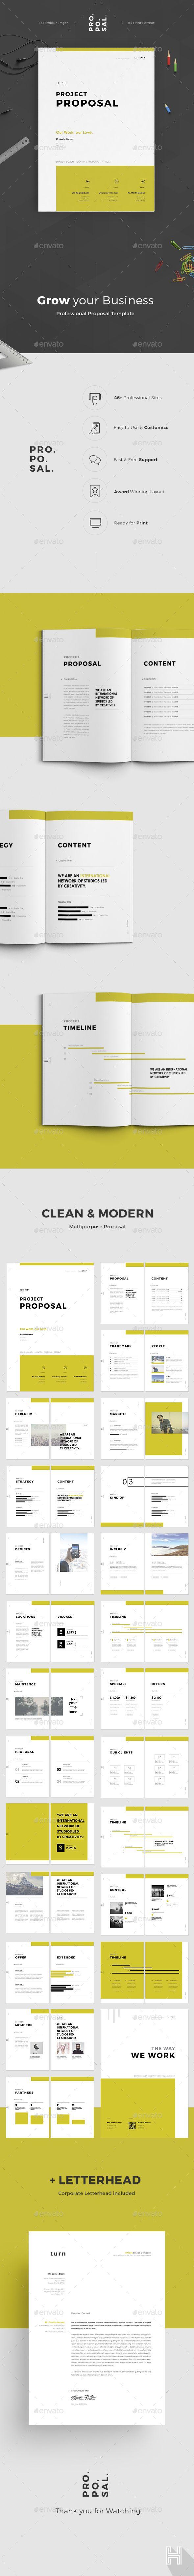 Proposal Proposal Design Presentation Design Template Business Proposal